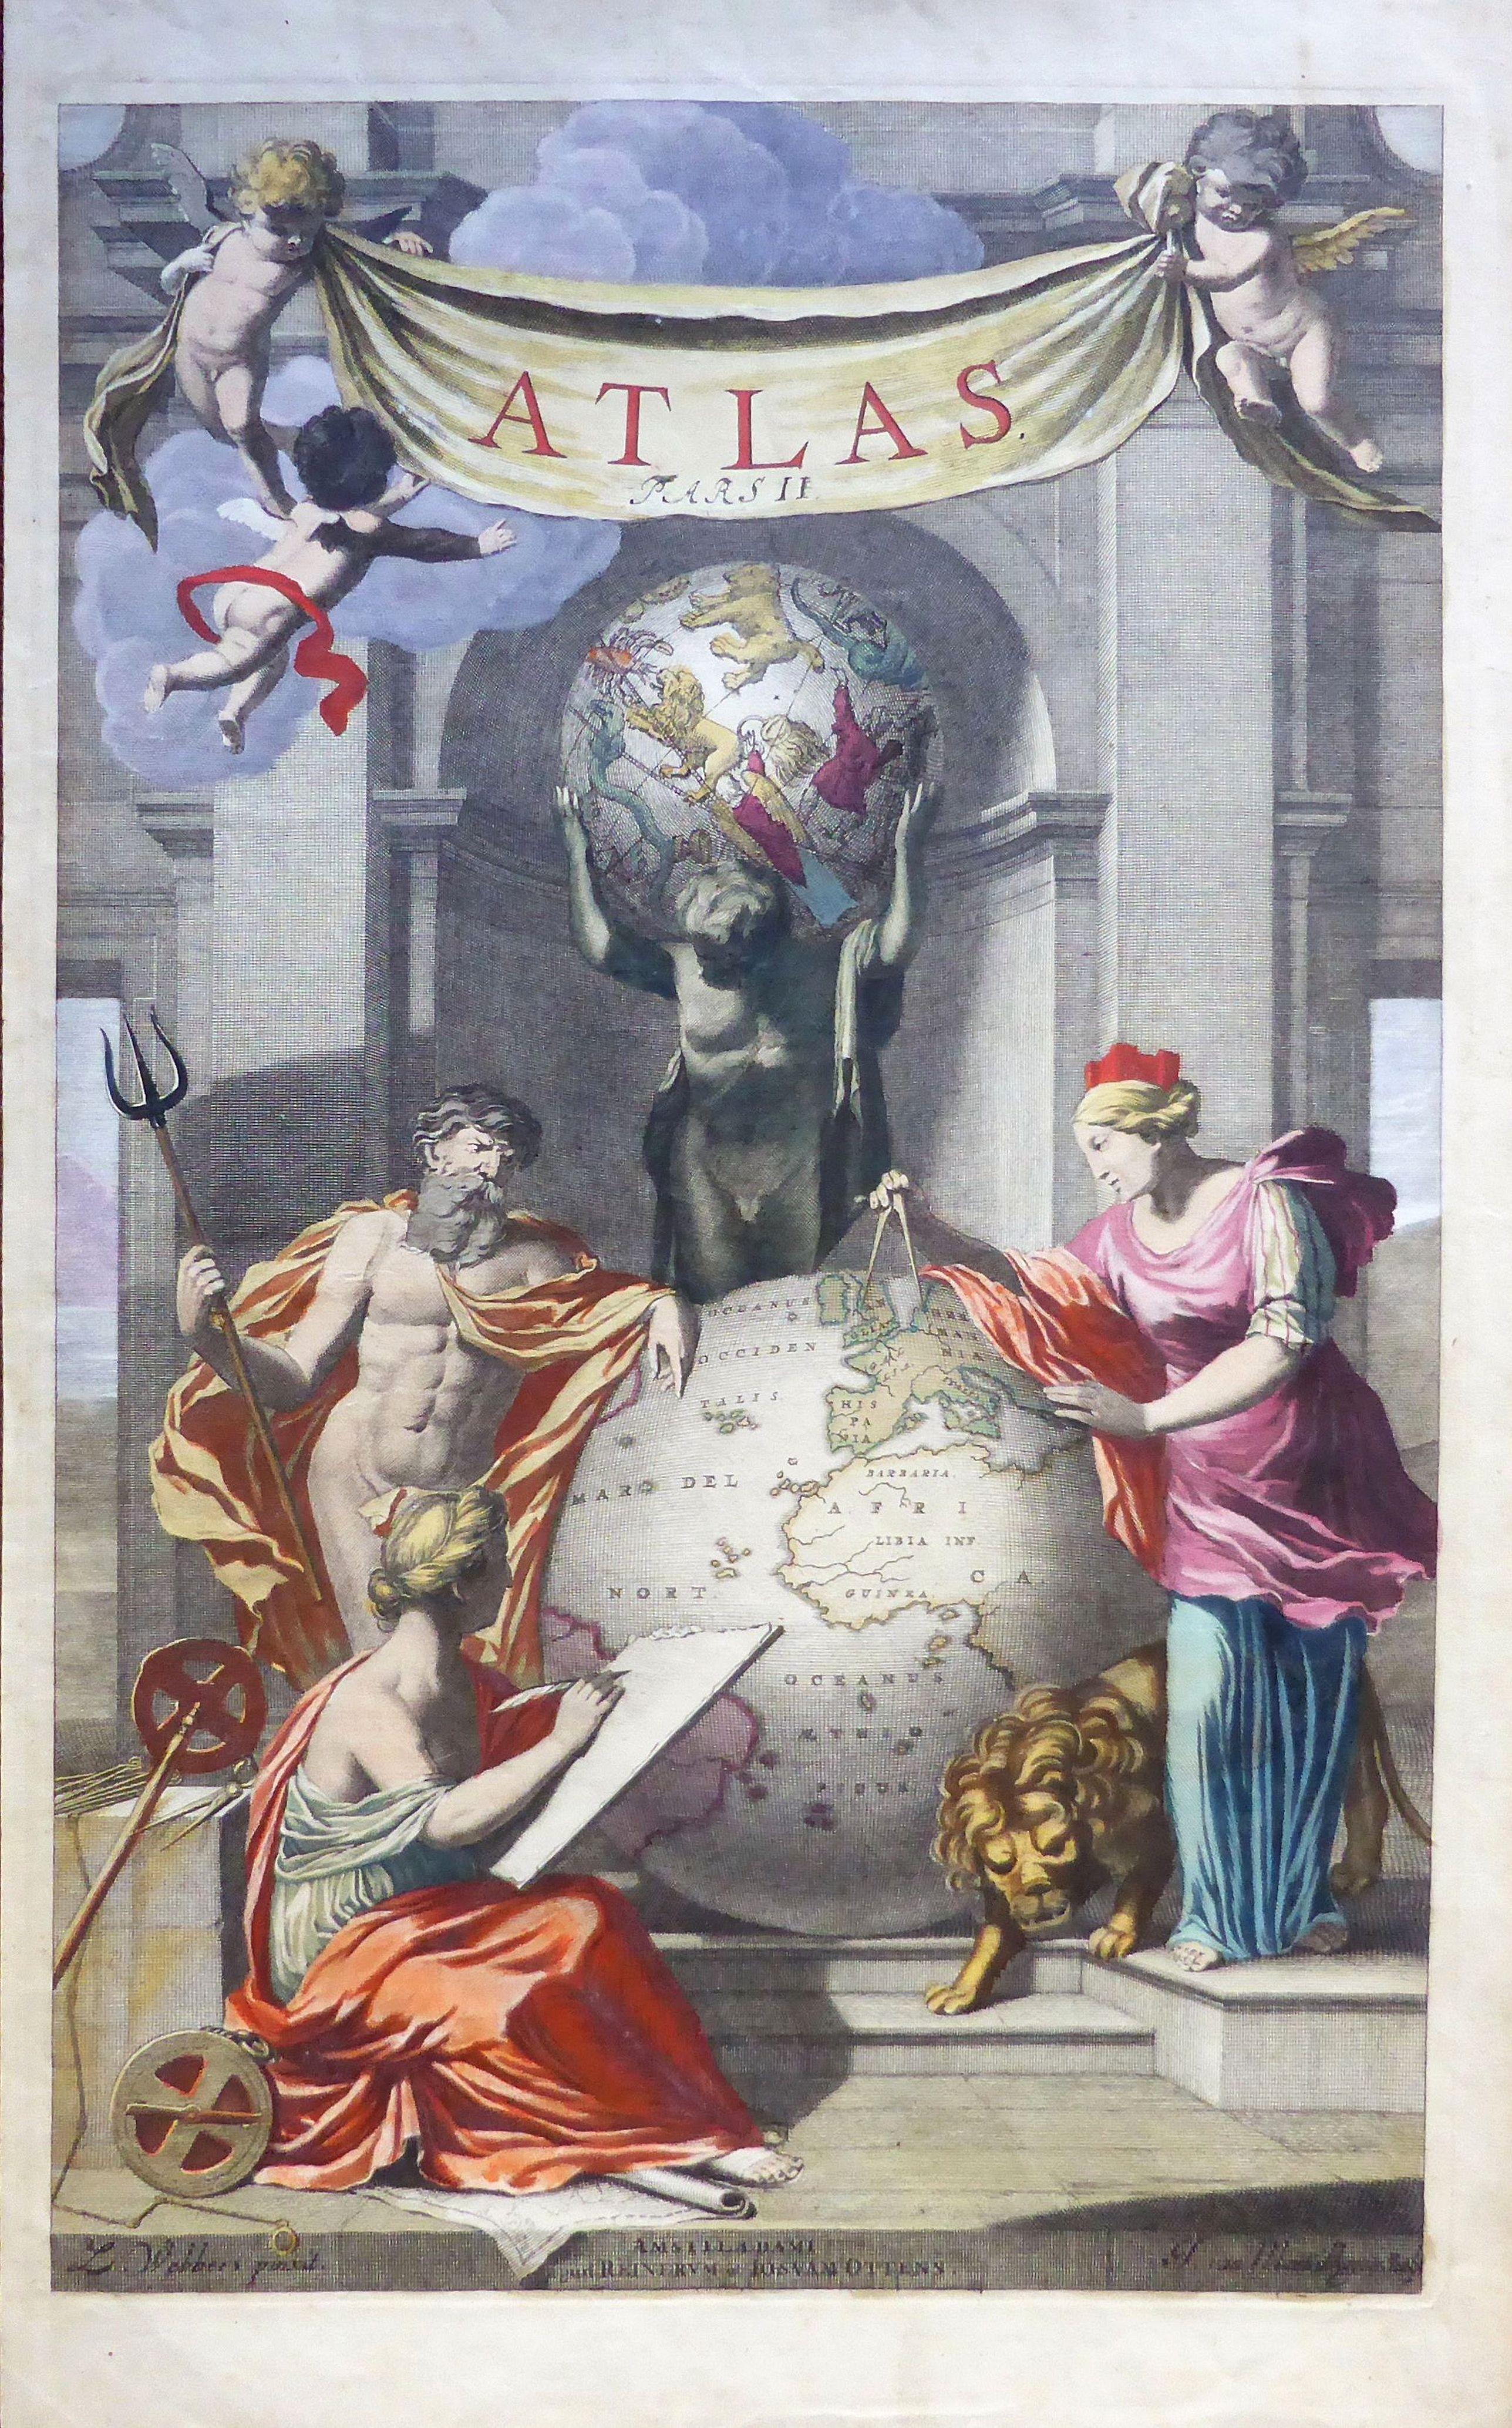 J van Munnikhuysen.  - ATLAS PARS II.